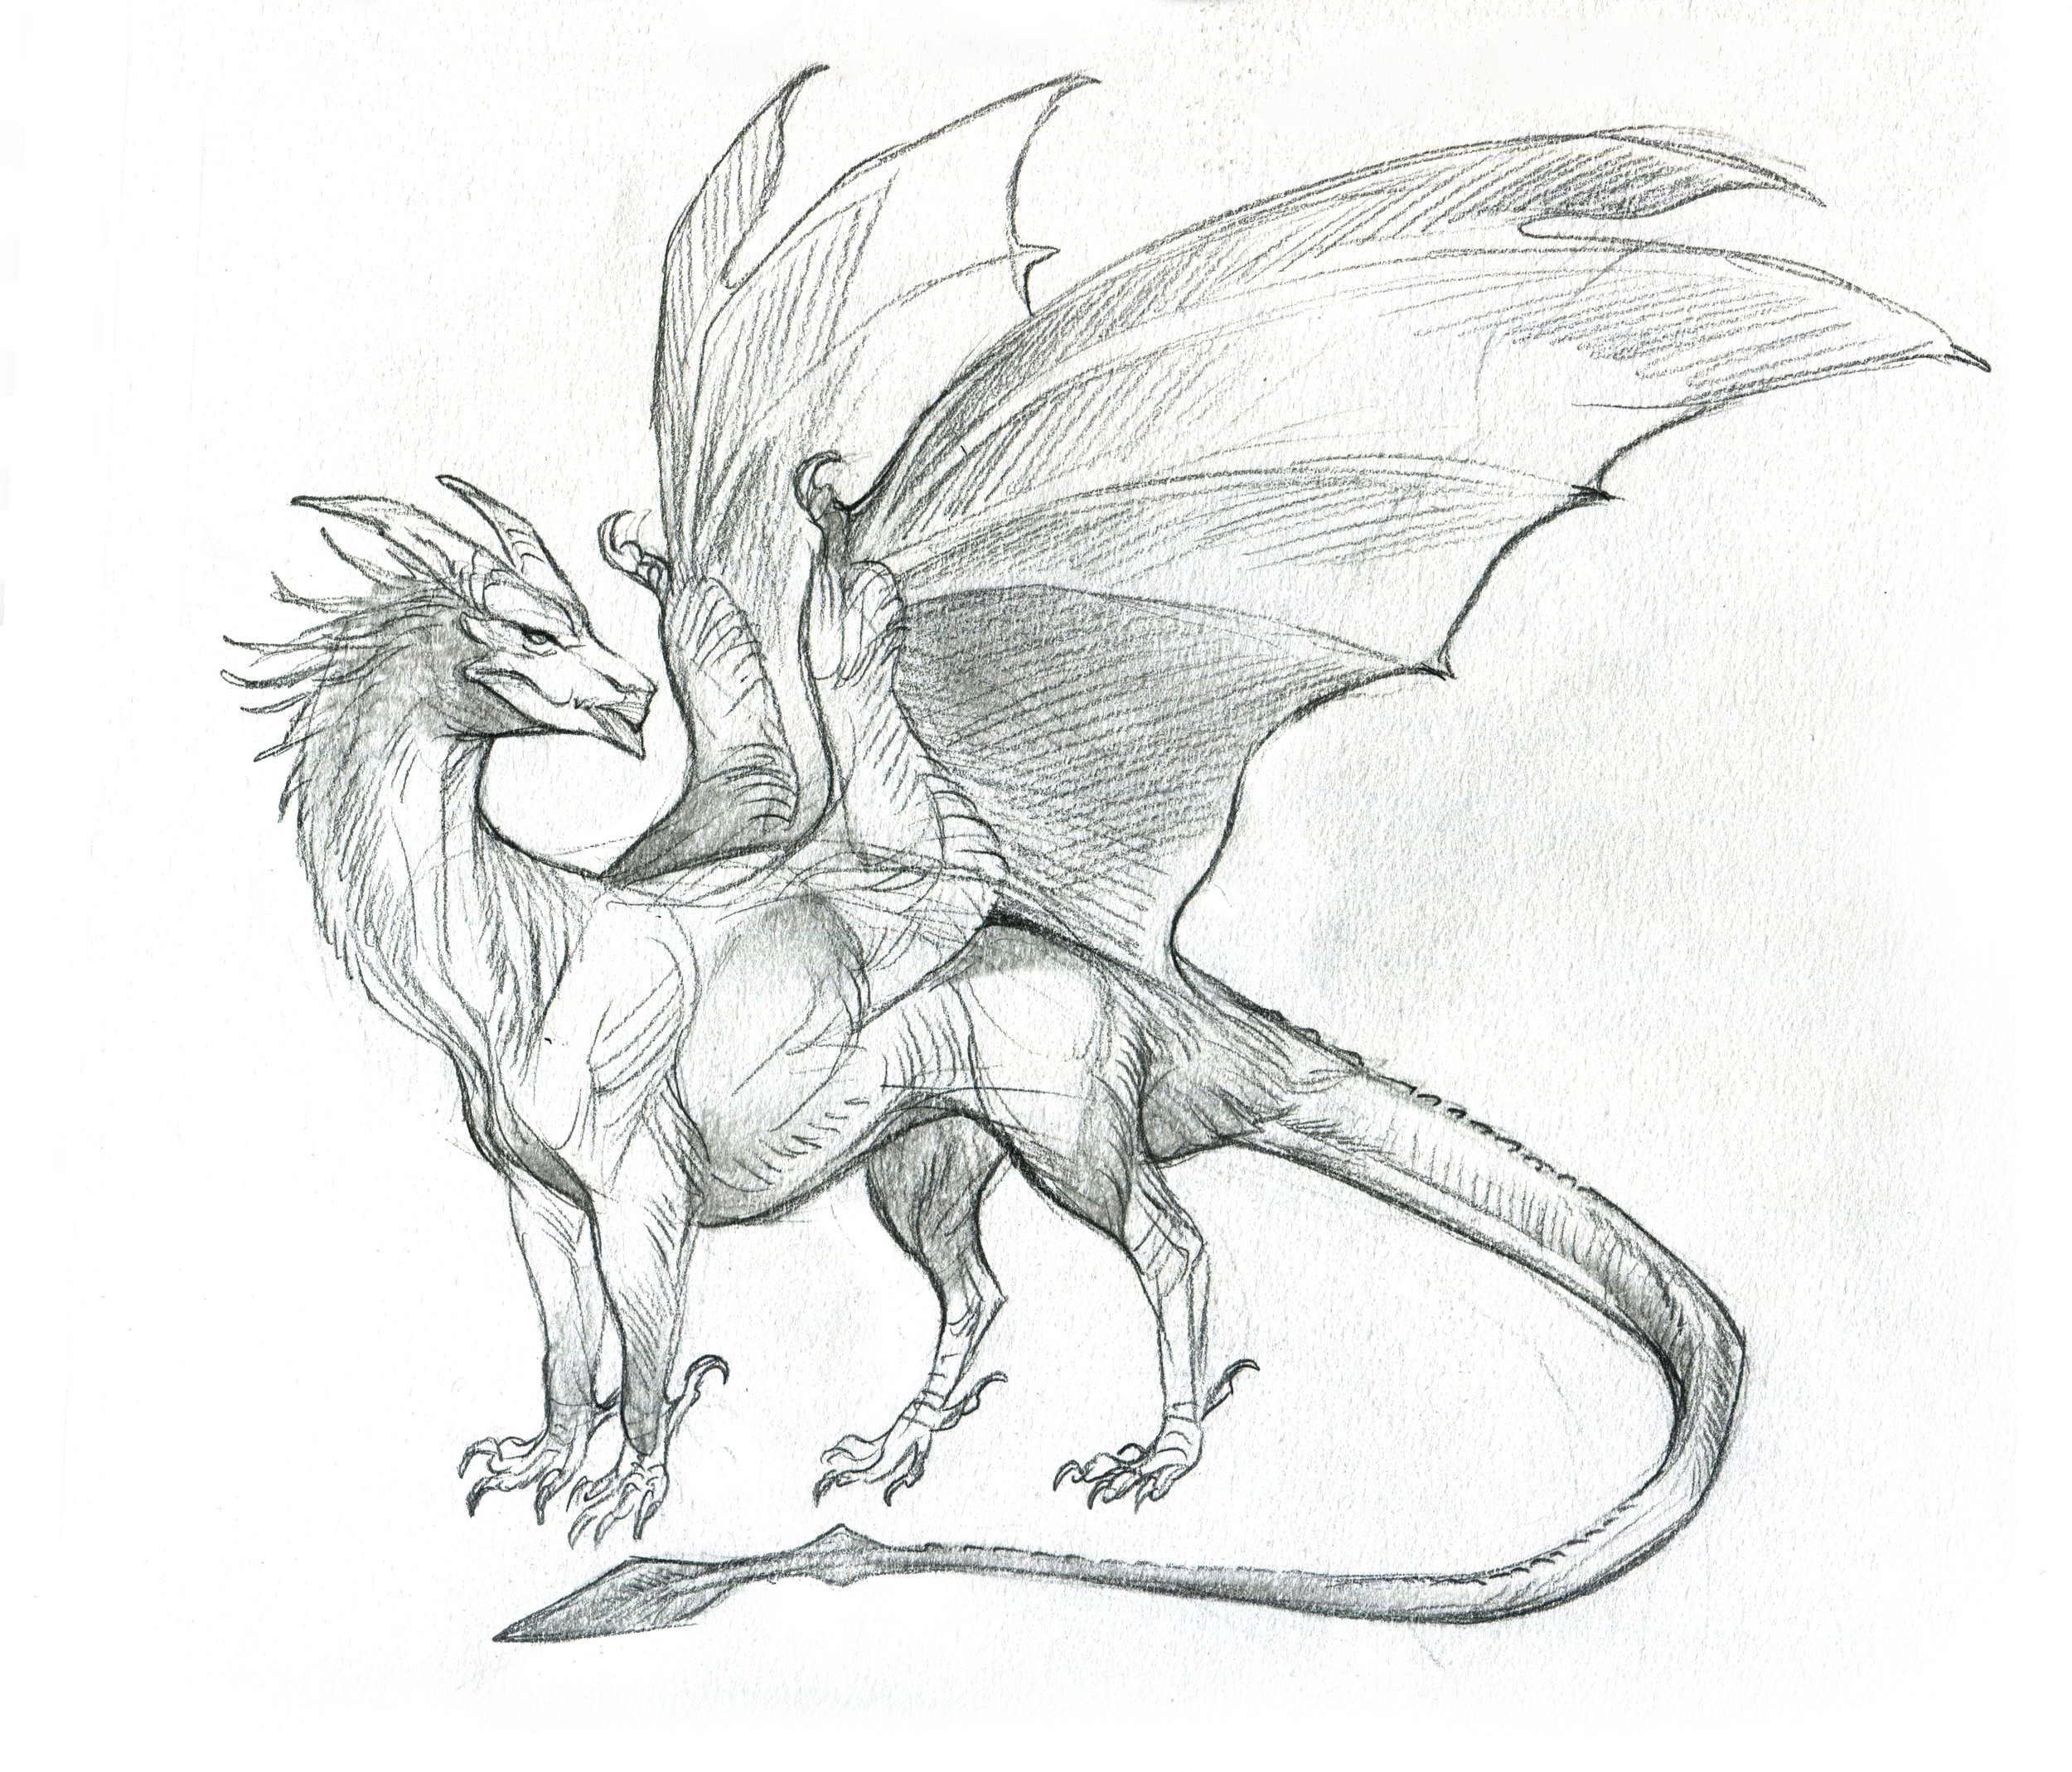 YiQi_dragonSketch.jpg